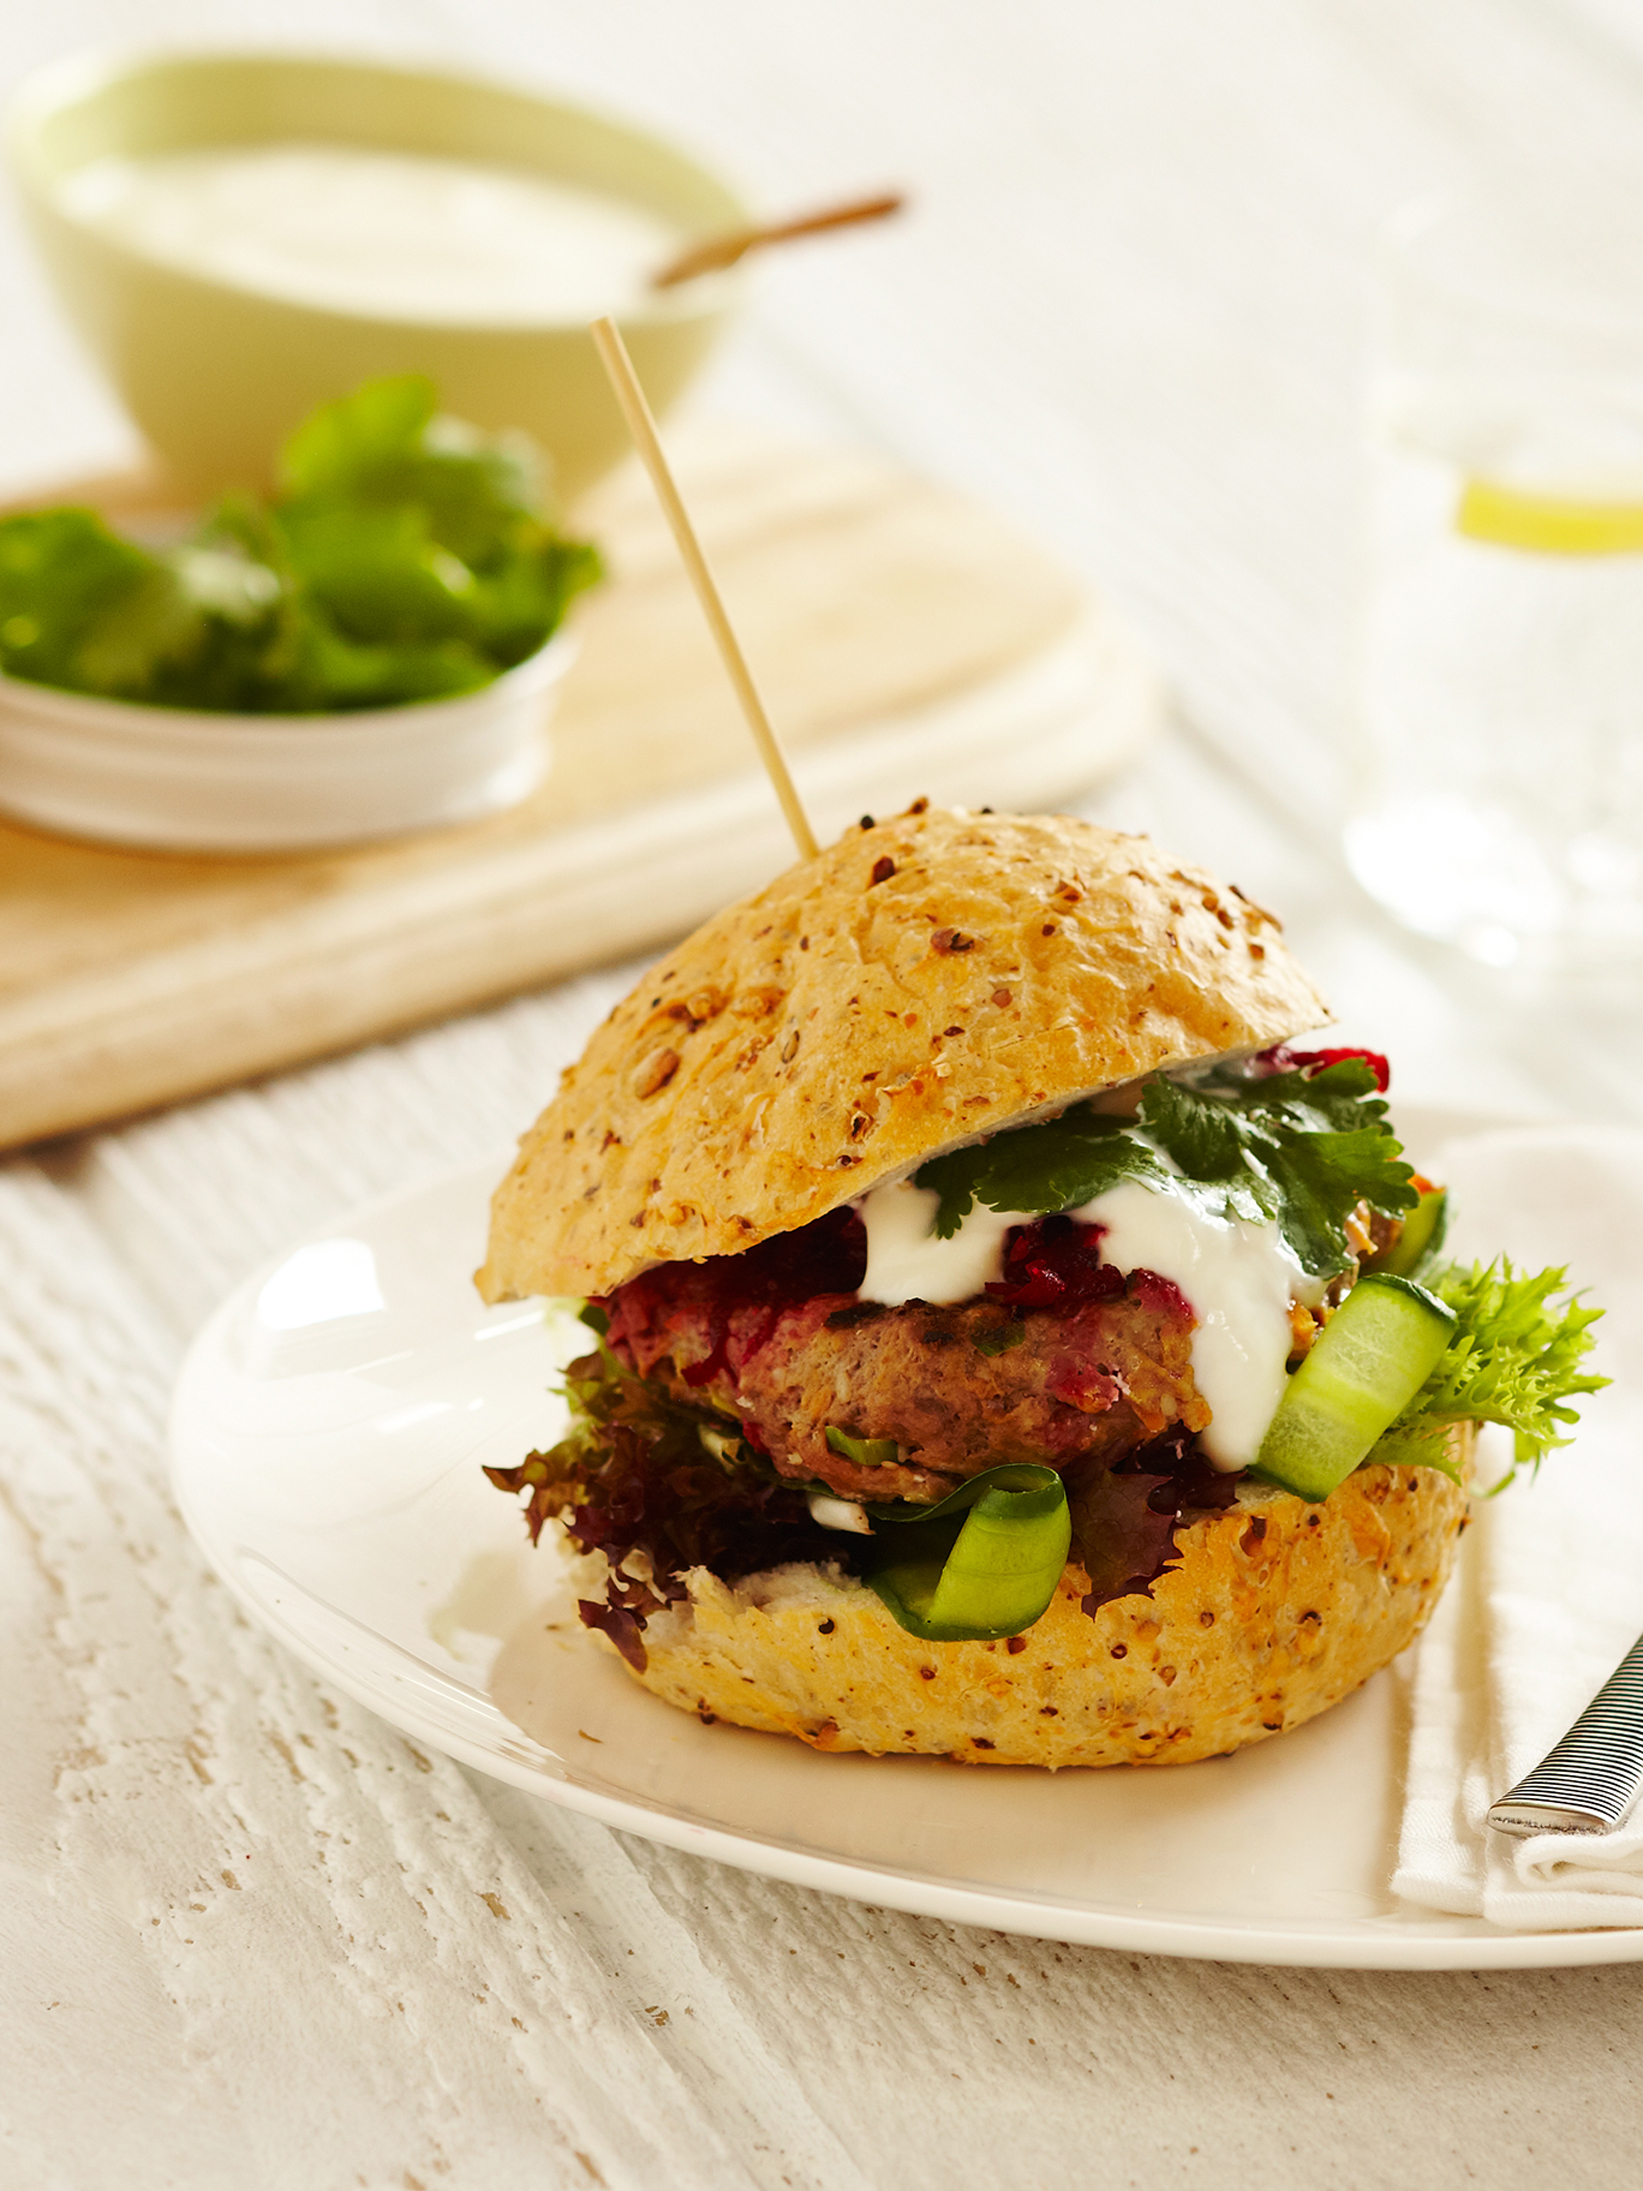 Spiced Lamb Burgers with Yogurt and Fresh Beetroot Relish